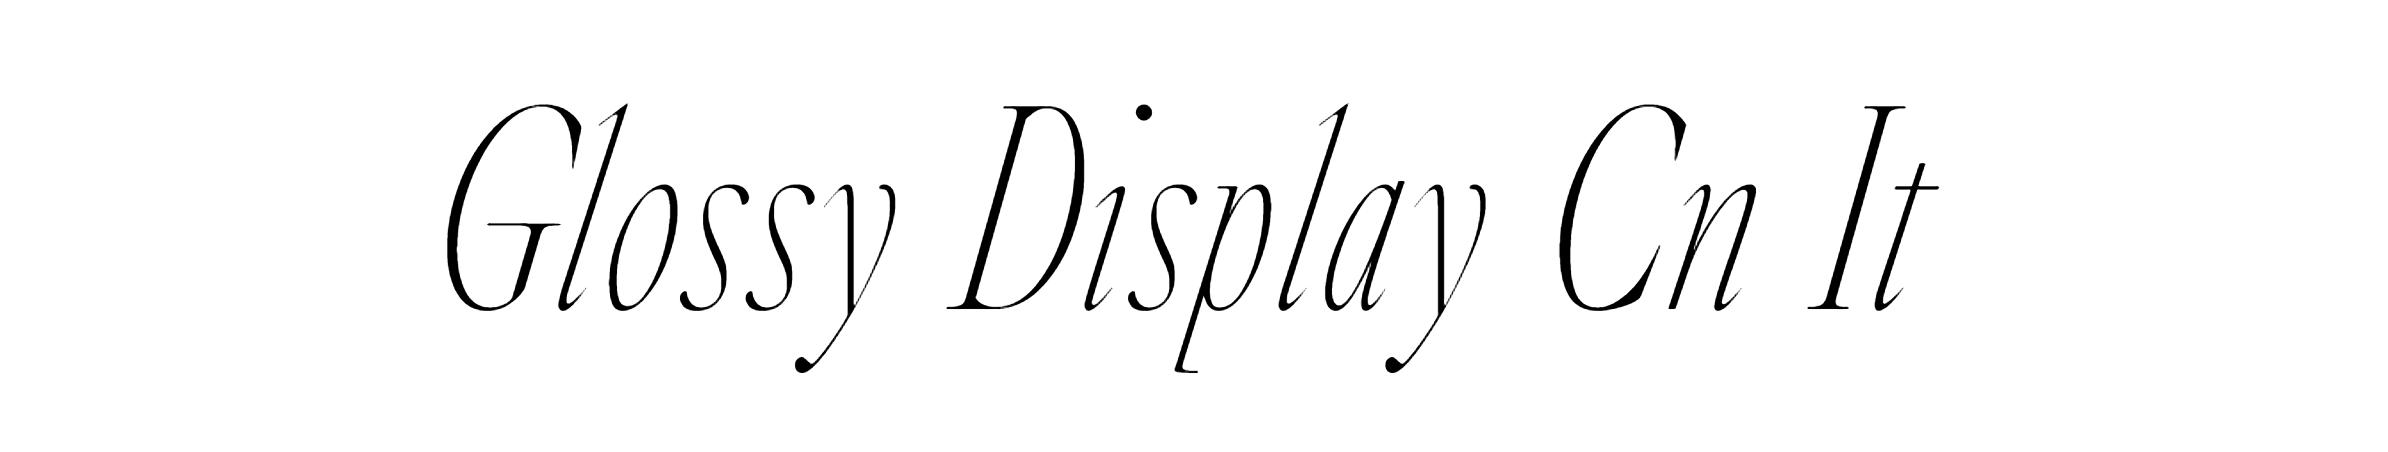 Glossy Display CN Italic